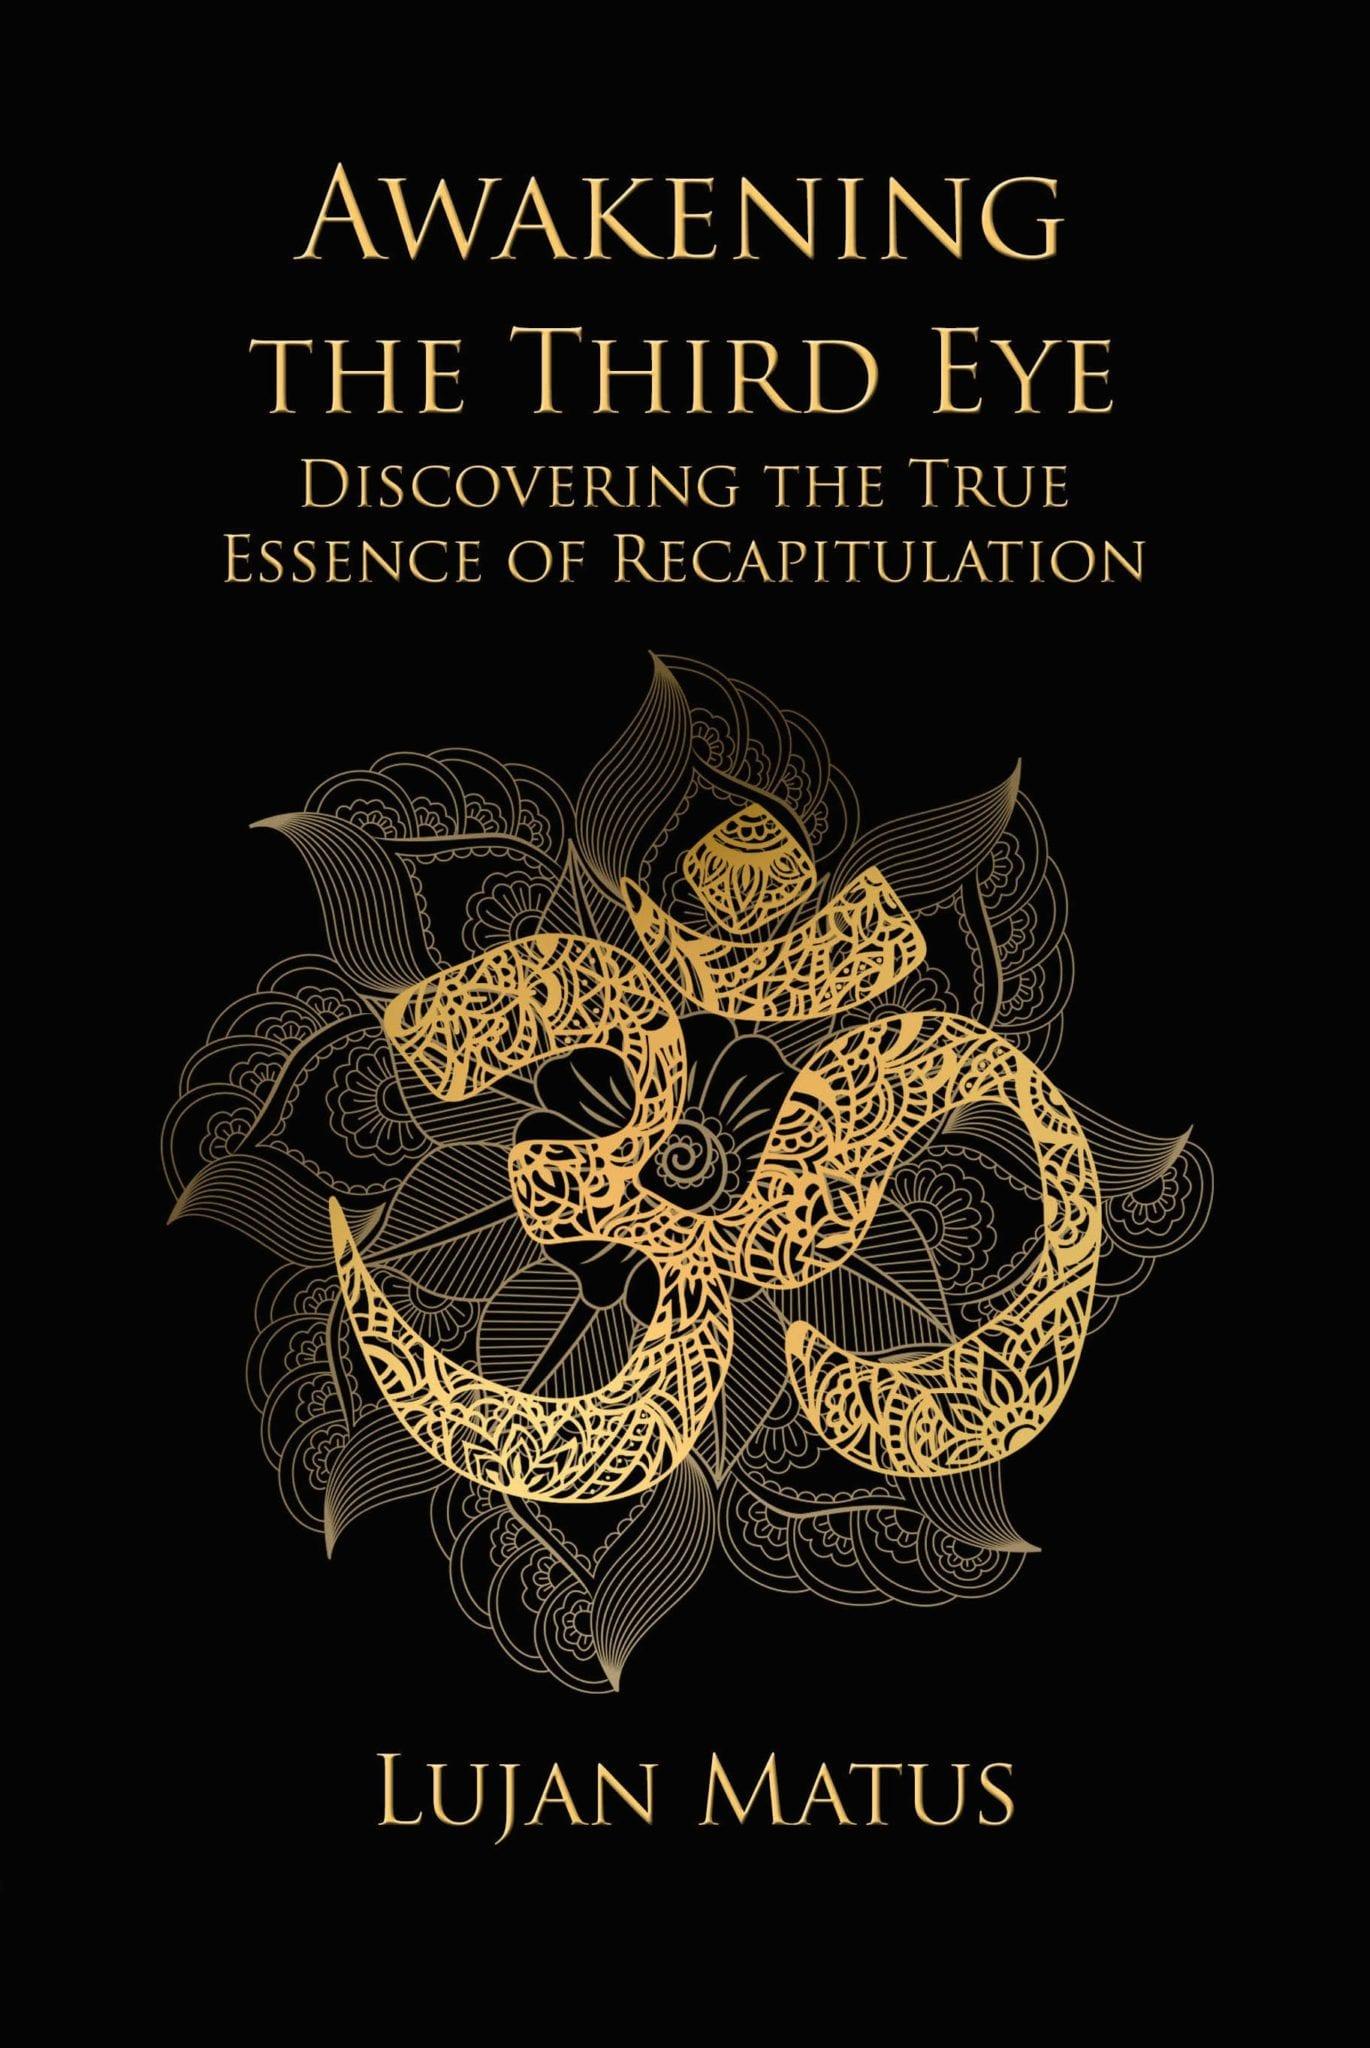 awakening-the-third-eye